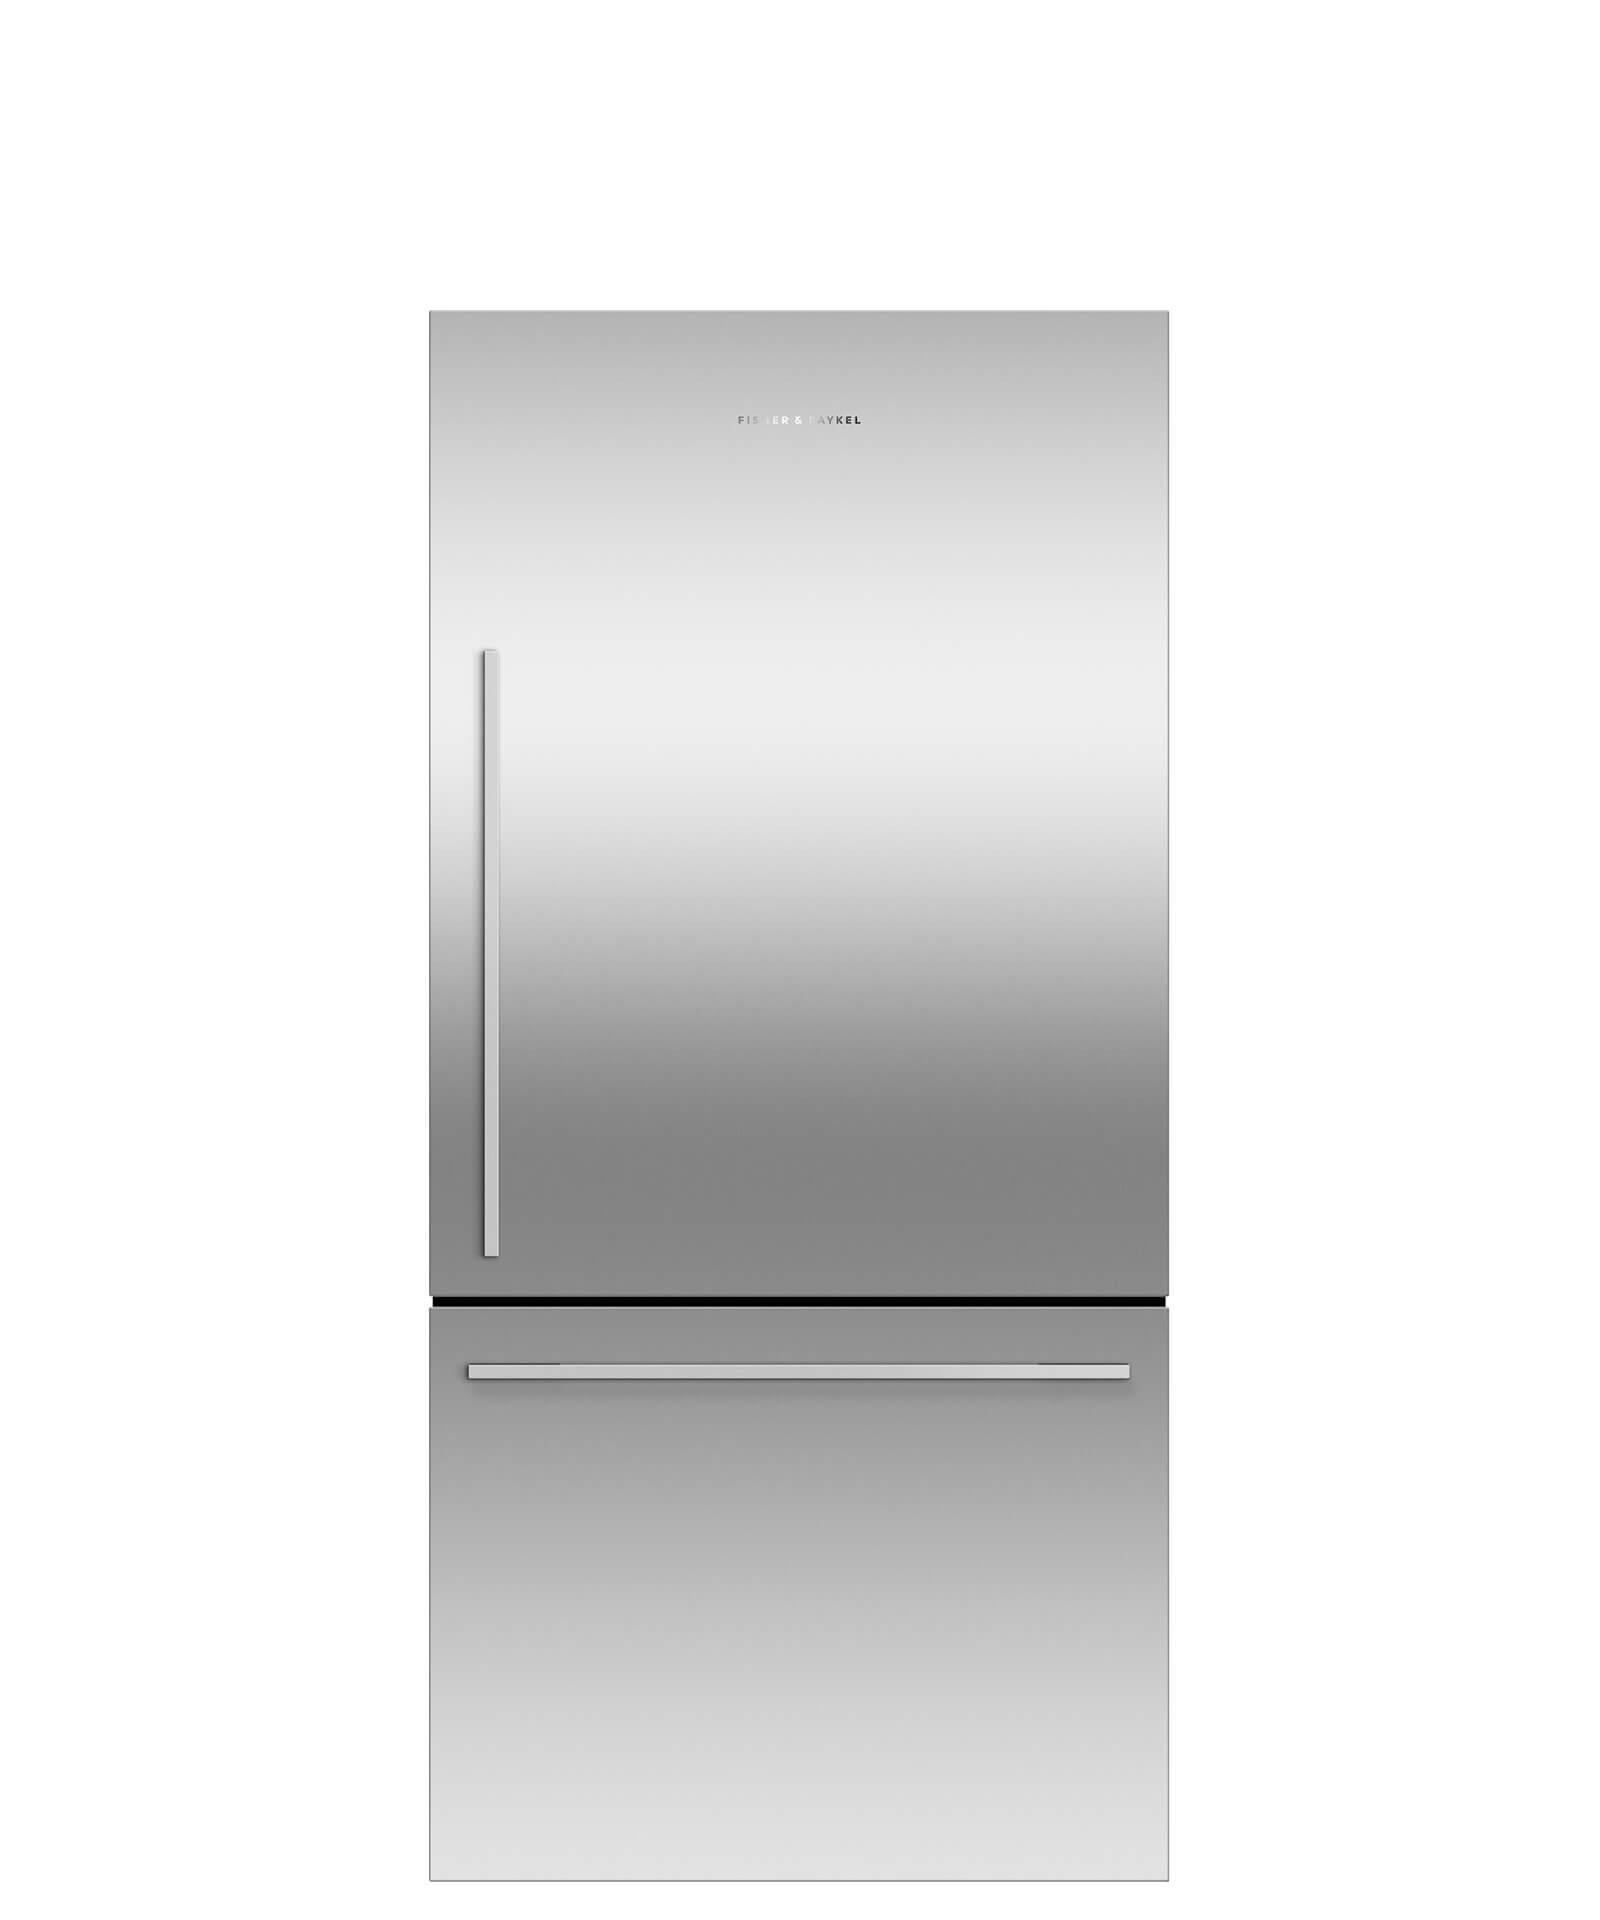 Counter Depth Refrigerator 17 cu ft--SCRATCH AND DENT